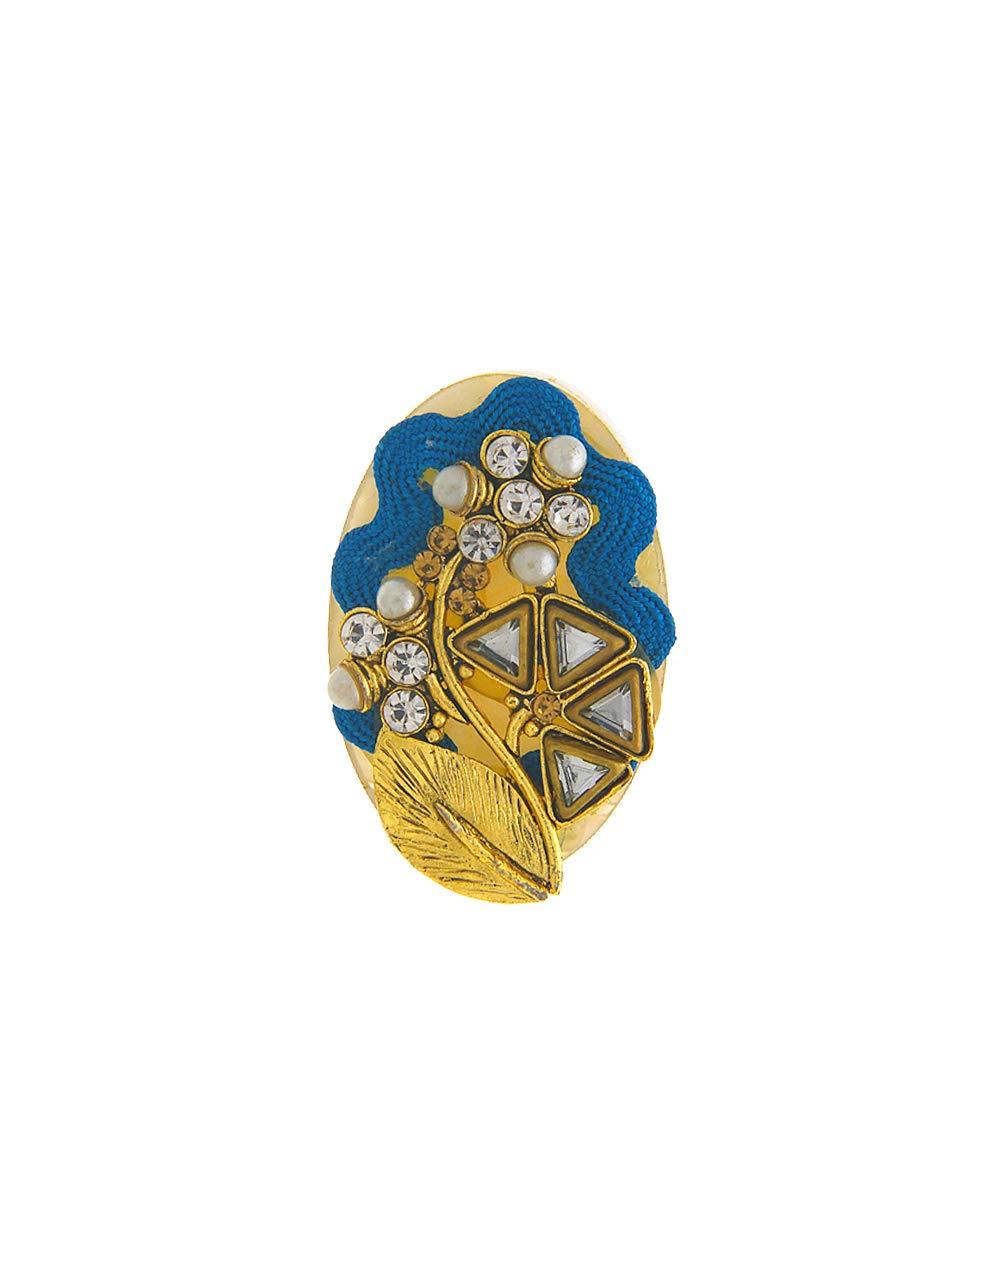 Anuradha Art Sky-Blue Colour Oval Shape Wonderful Designer Saree/Sari Pin for Women/Girls